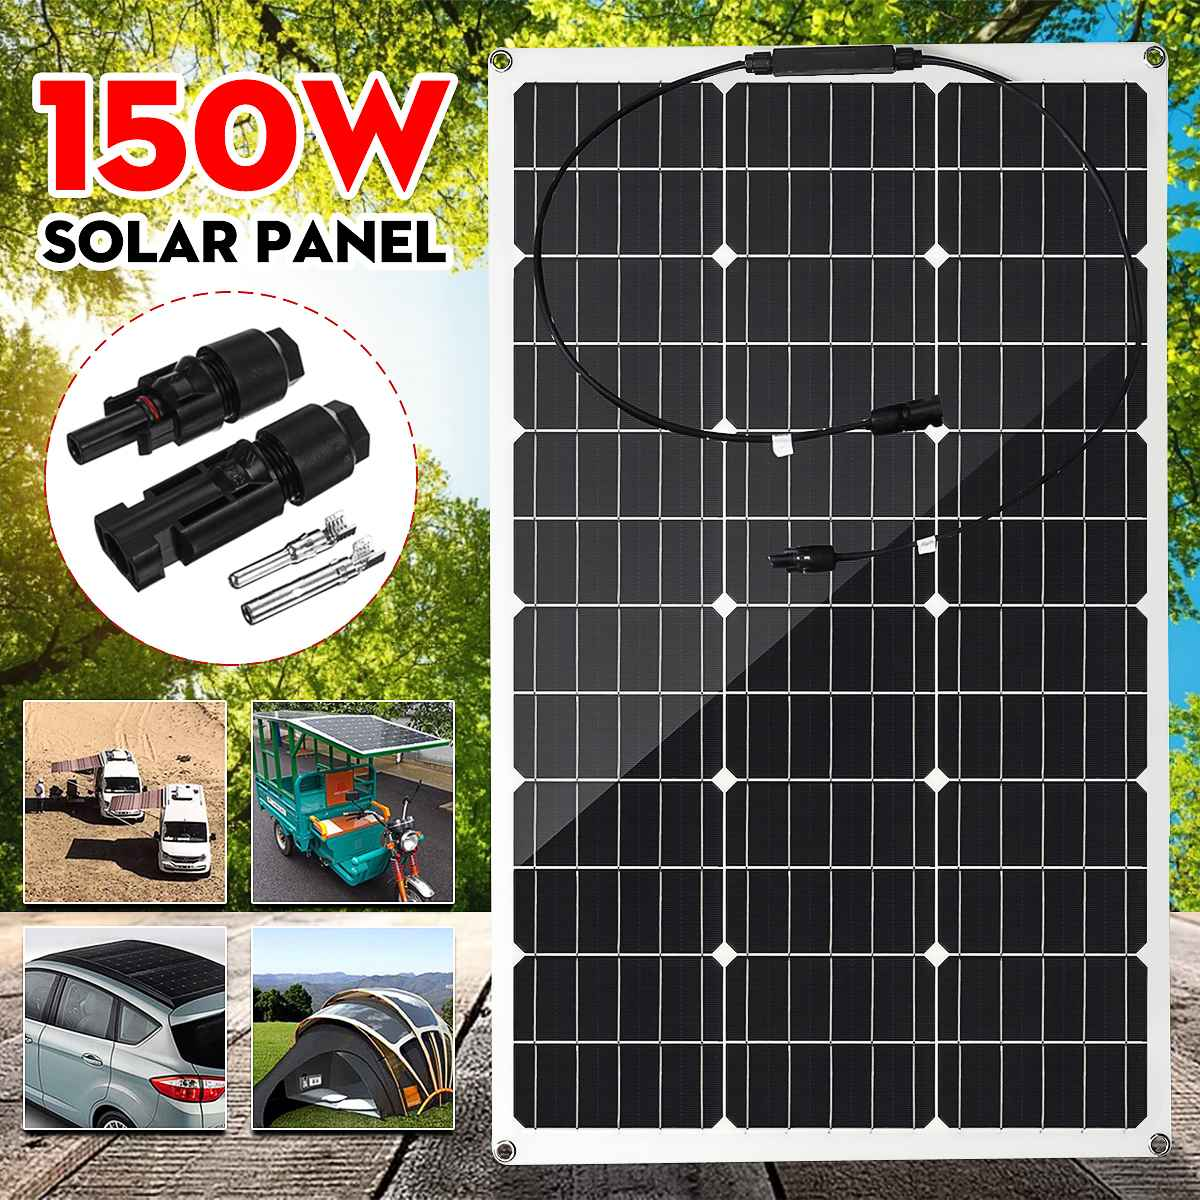 Panel Solar de 300W/150W, Cable de módem Solar semiflexible de 18V para coche, yate, luz, batería, conector para exteriores, cargador de batería Wallpad L6, toma de corriente blanca cuádruple de 4 vías, enchufe alemán de la UE, toma de corriente Schuko, toma de pared con Panel de vidrio templado de 344x86mm, 4 puertos, 4 entradas